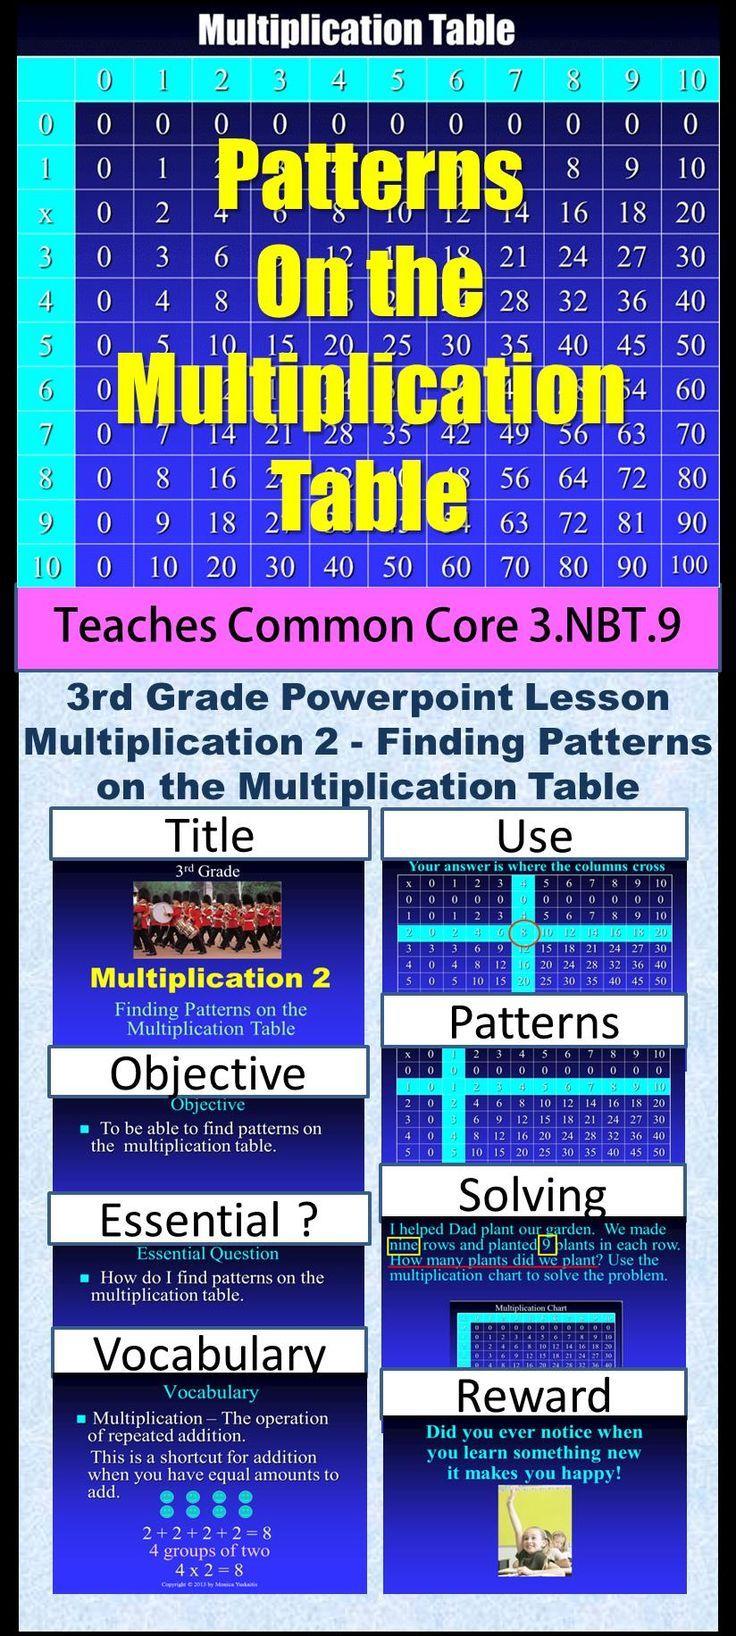 25 beste ideen over vermenigvuldigingsgrafiek op pinterest common core 3rd multiplication 2 finding patterns on multiplication chart gamestrikefo Image collections